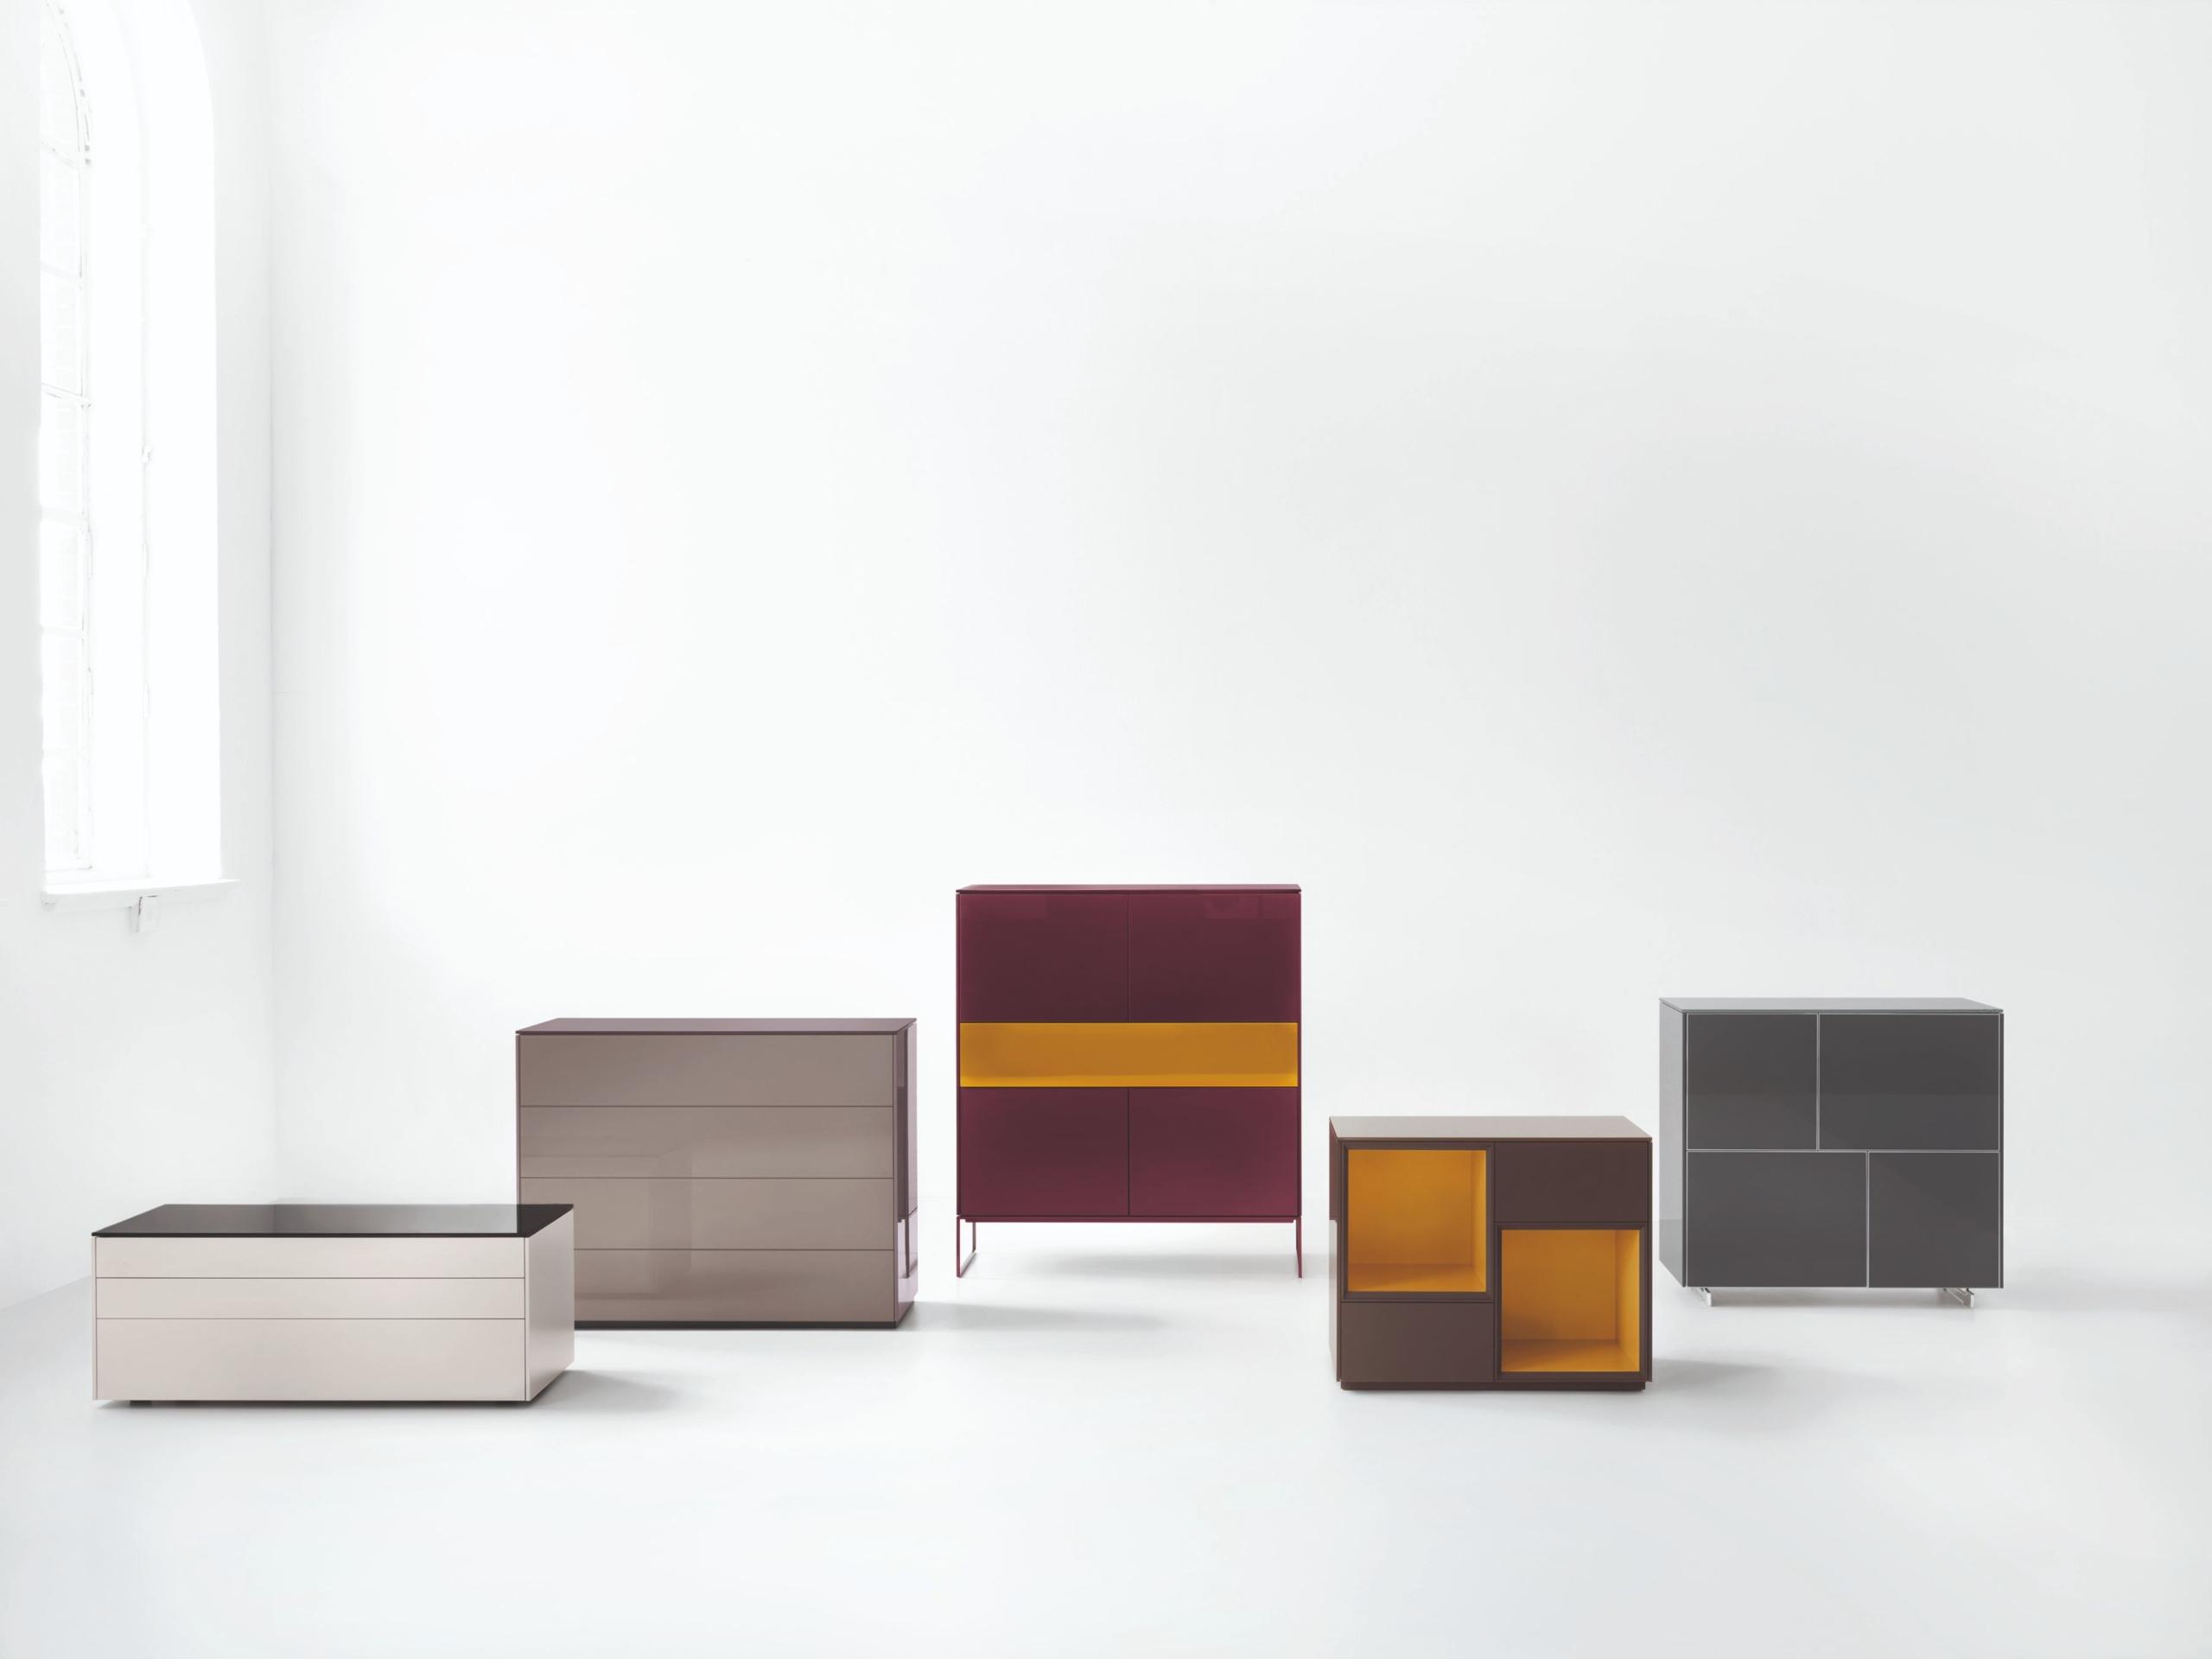 Piure - Nex Box